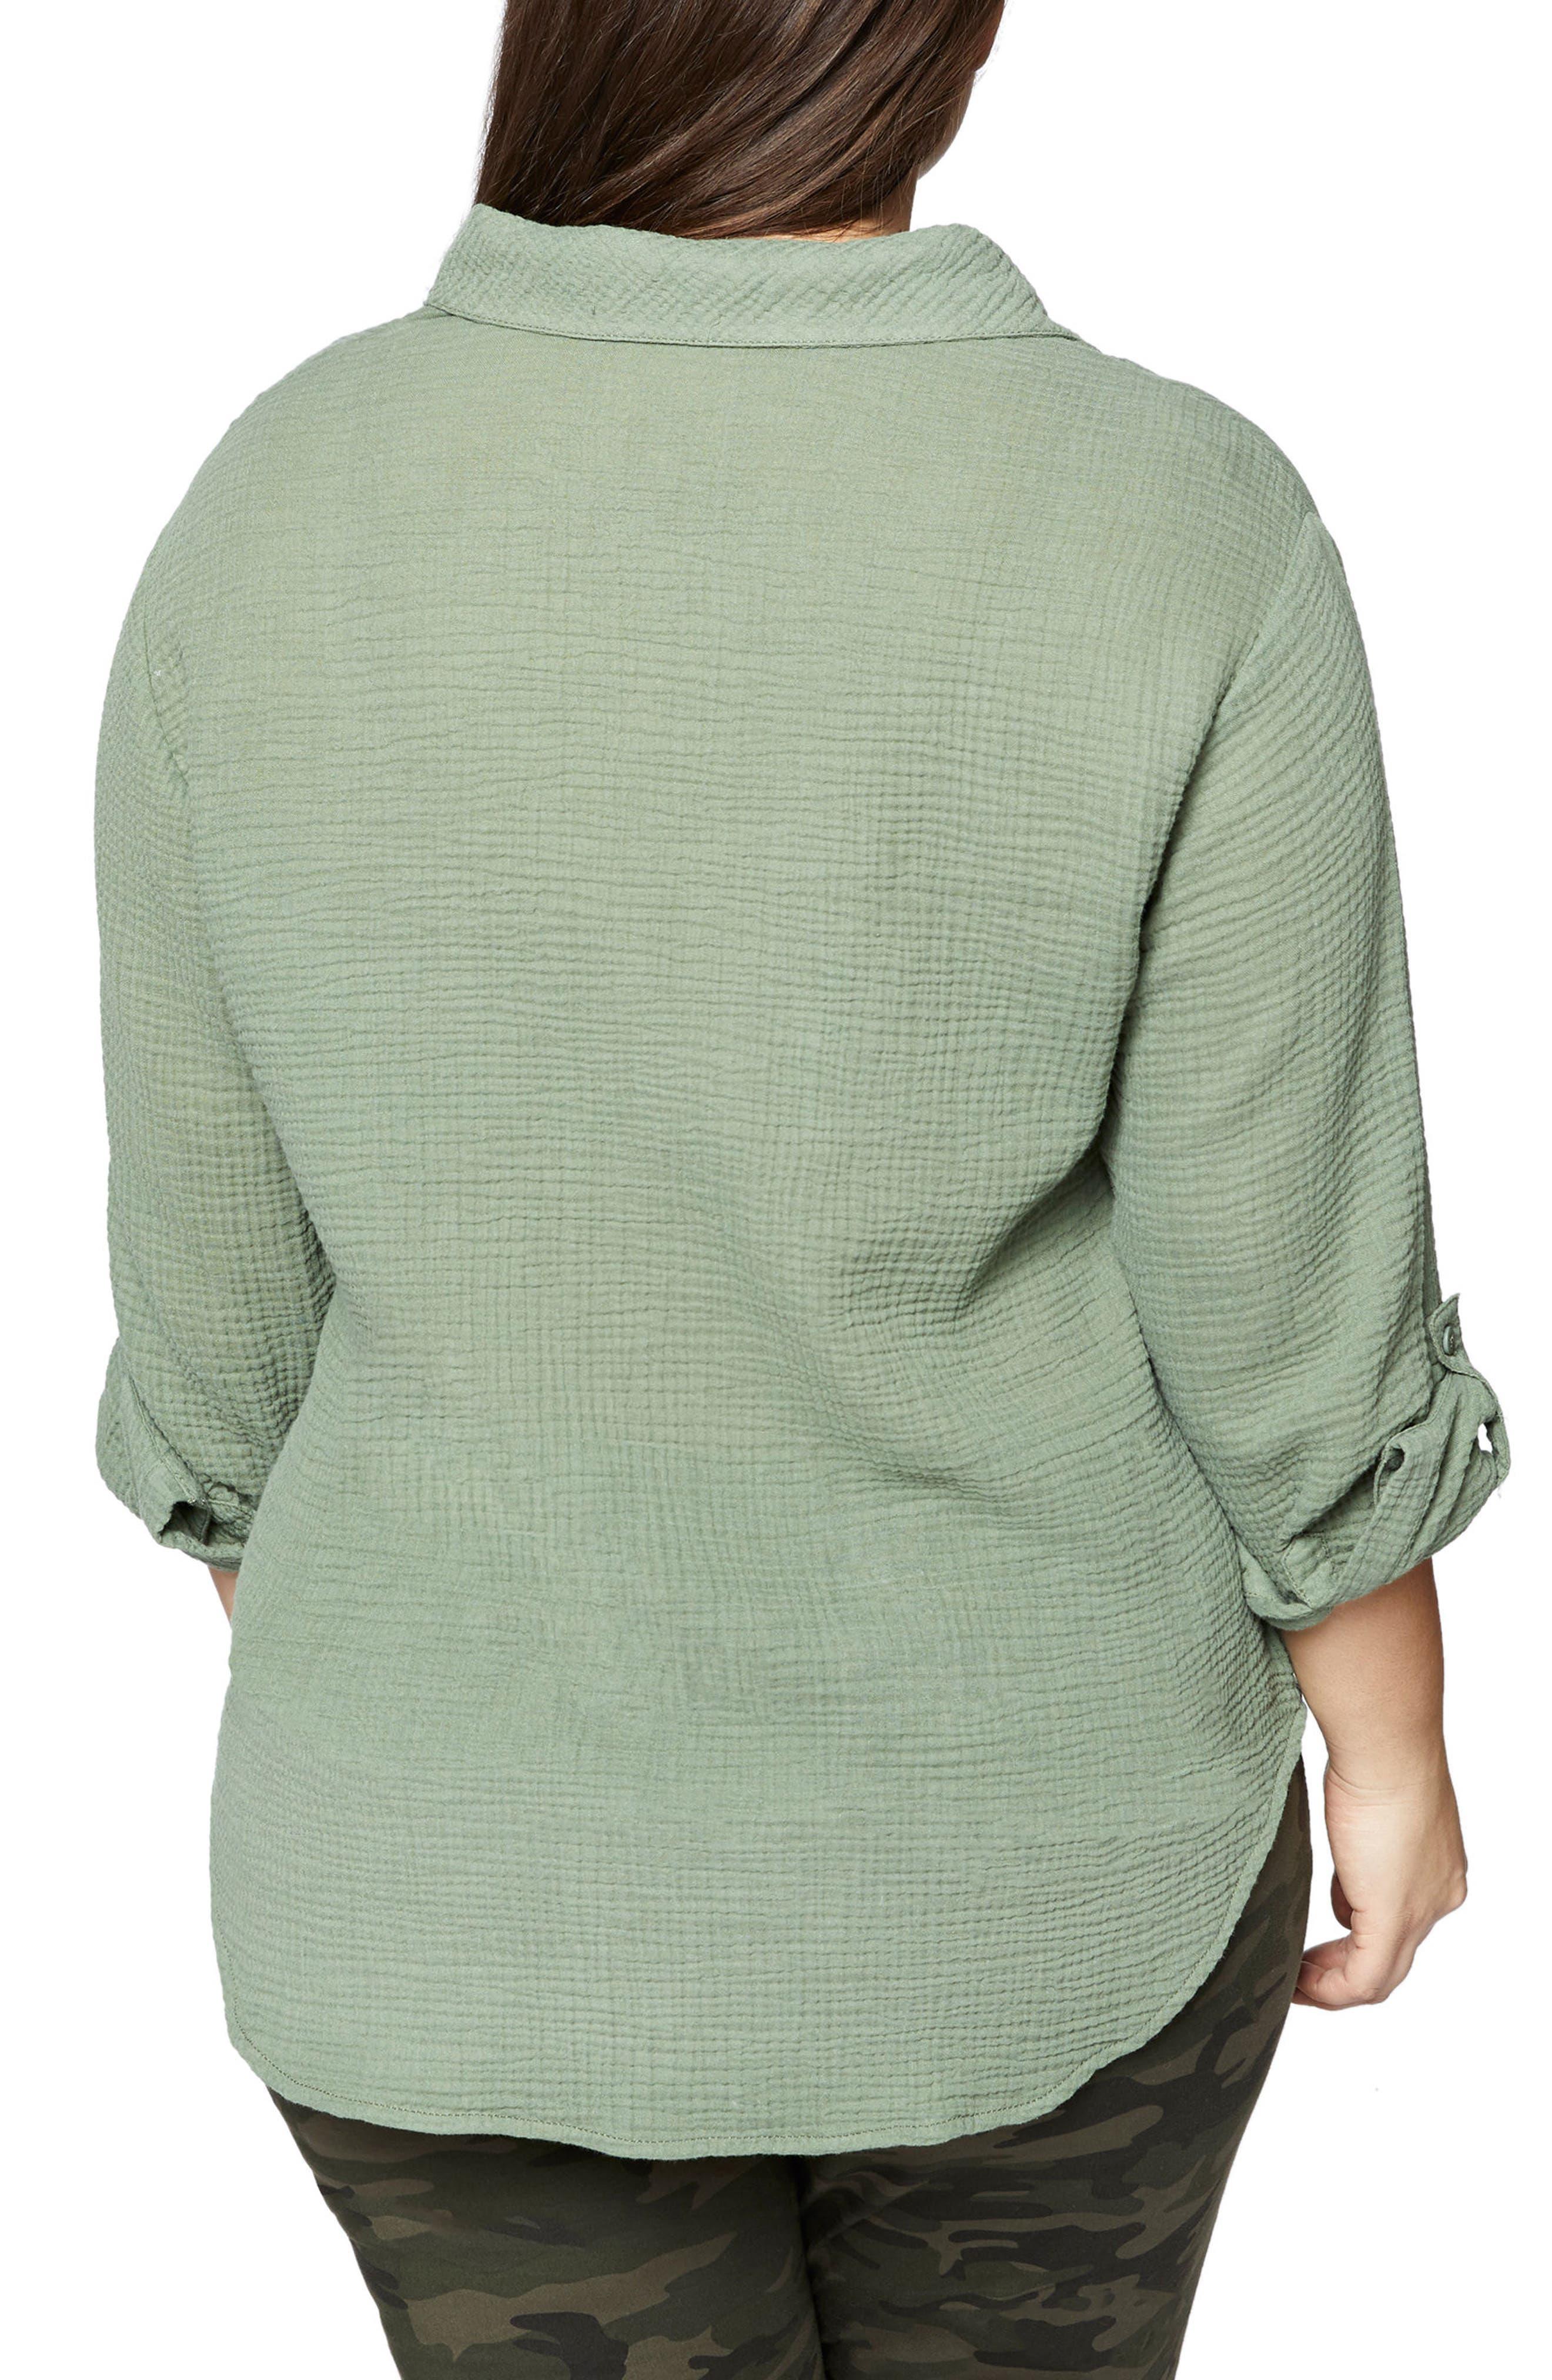 Steady Boyfriend Shirt,                             Alternate thumbnail 2, color,                             Cadet